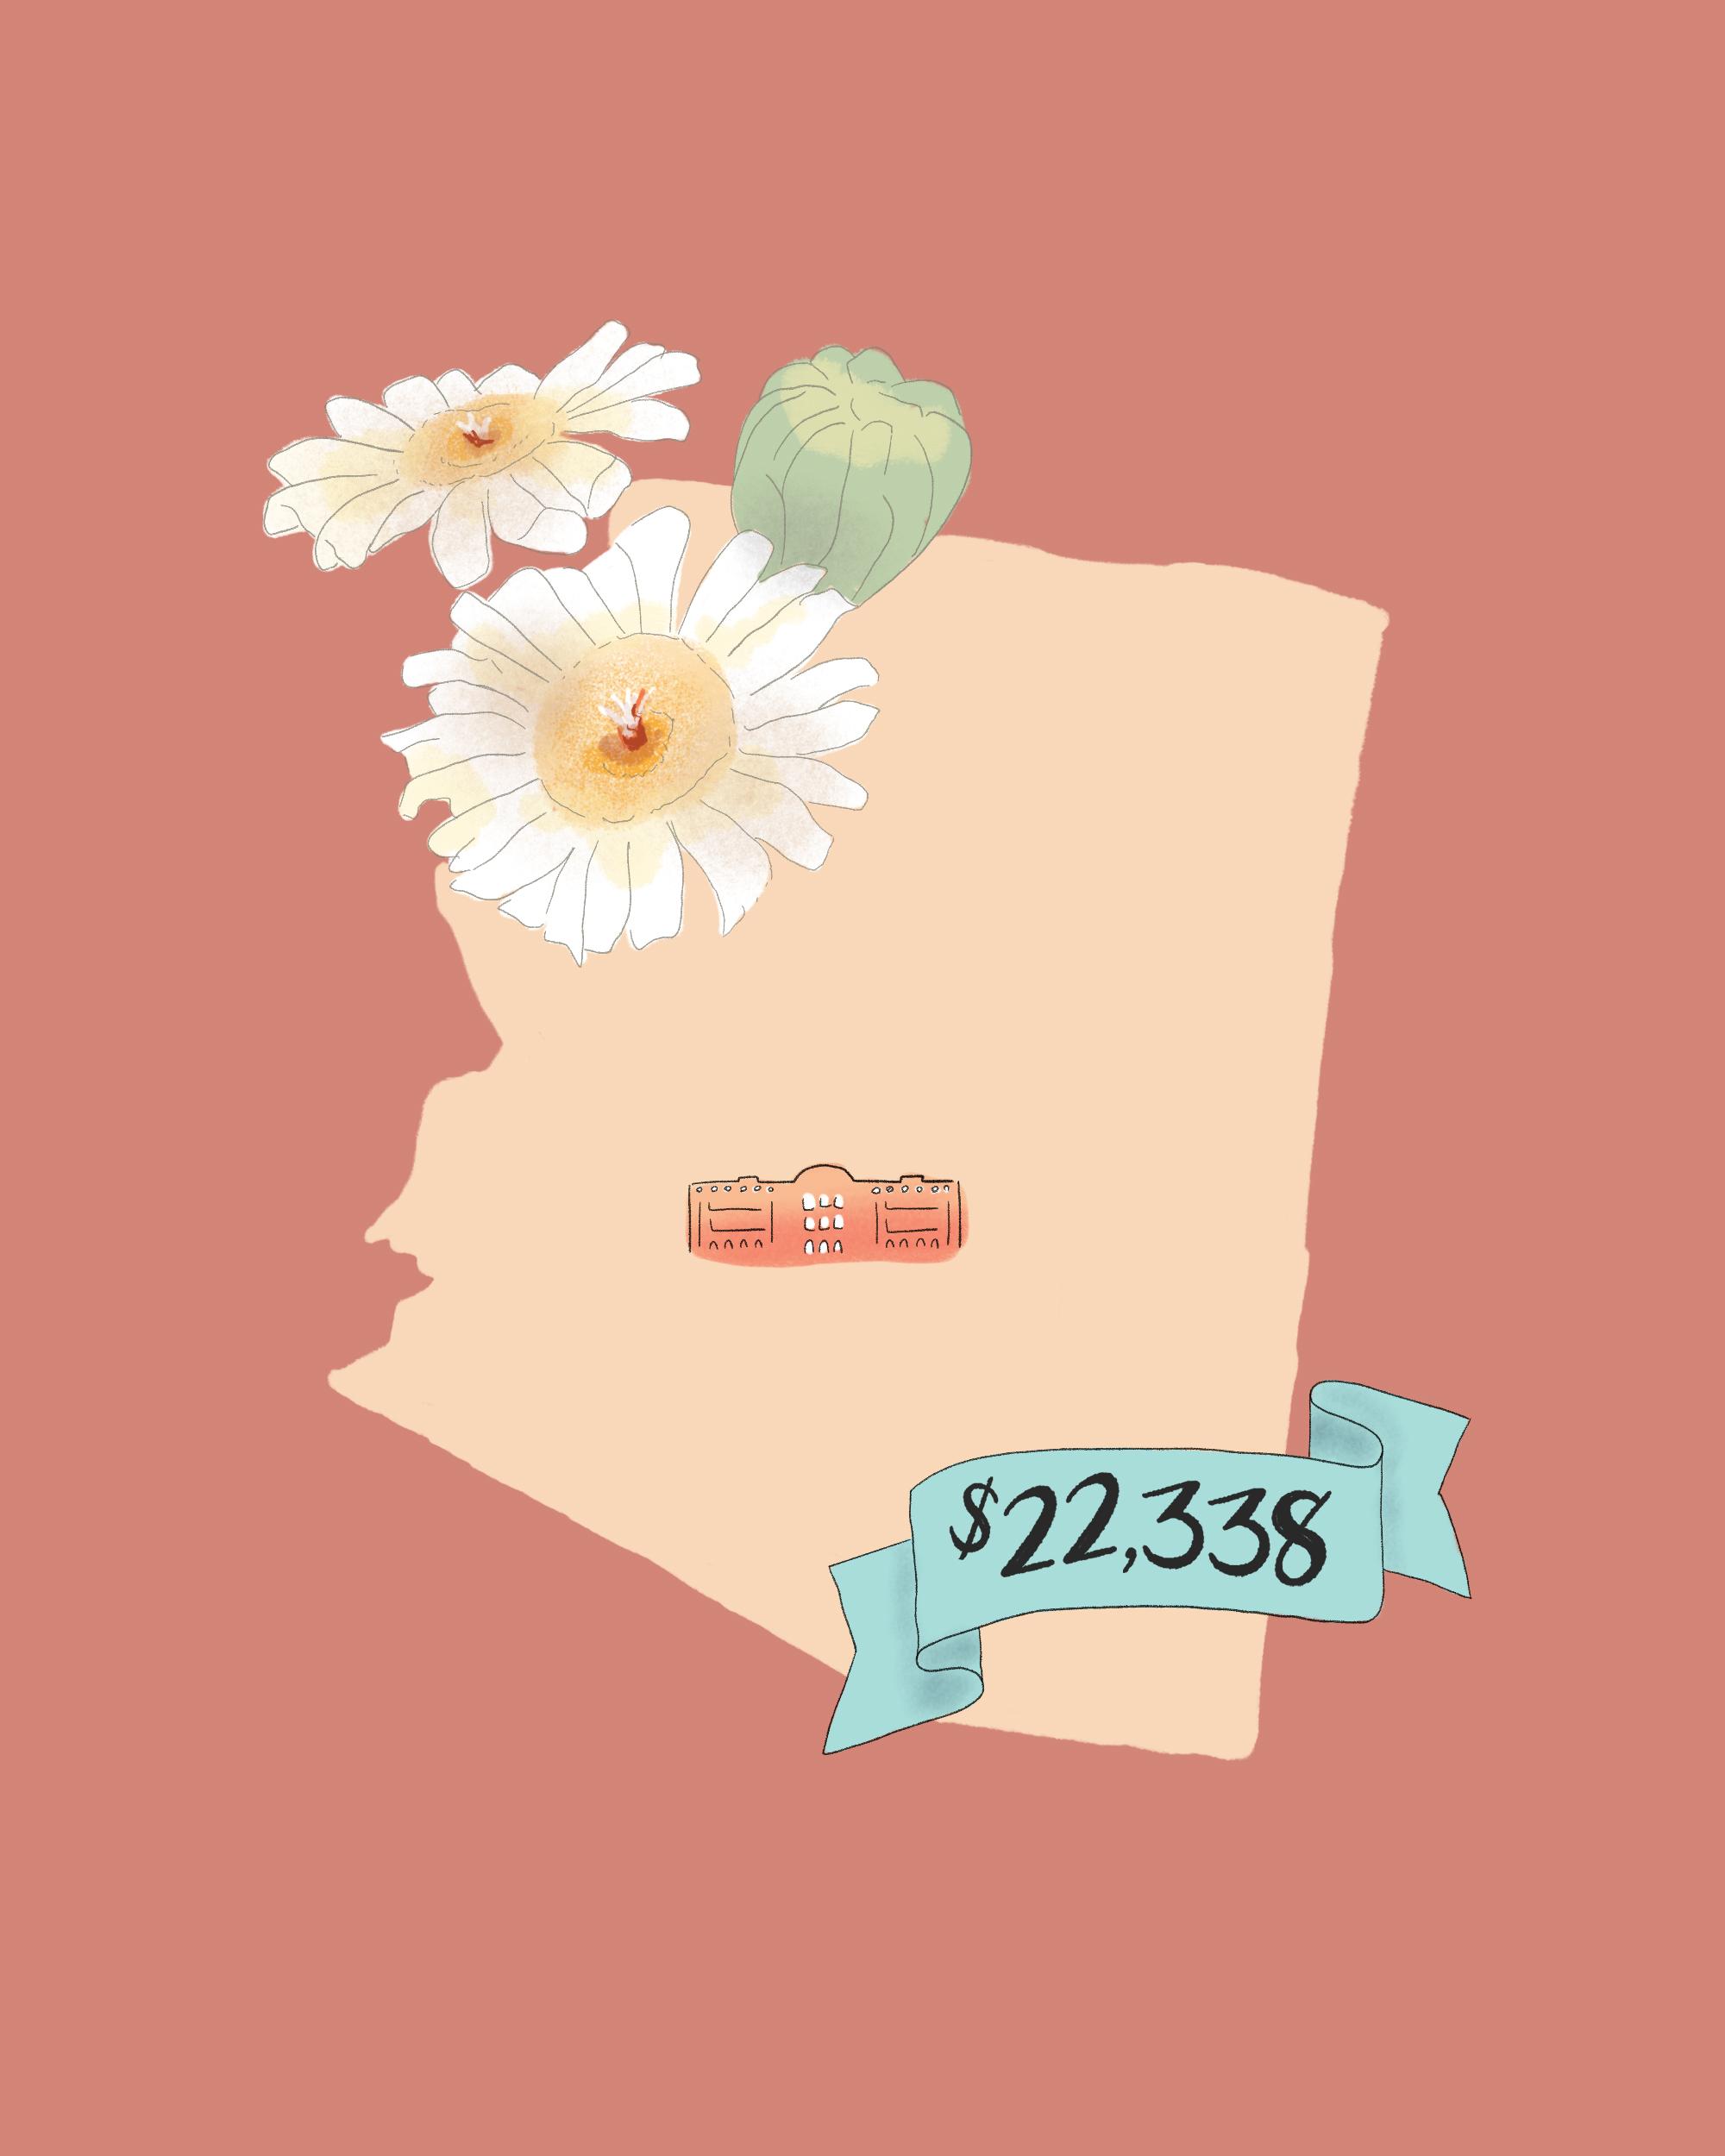 state wedding costs illustration arizona